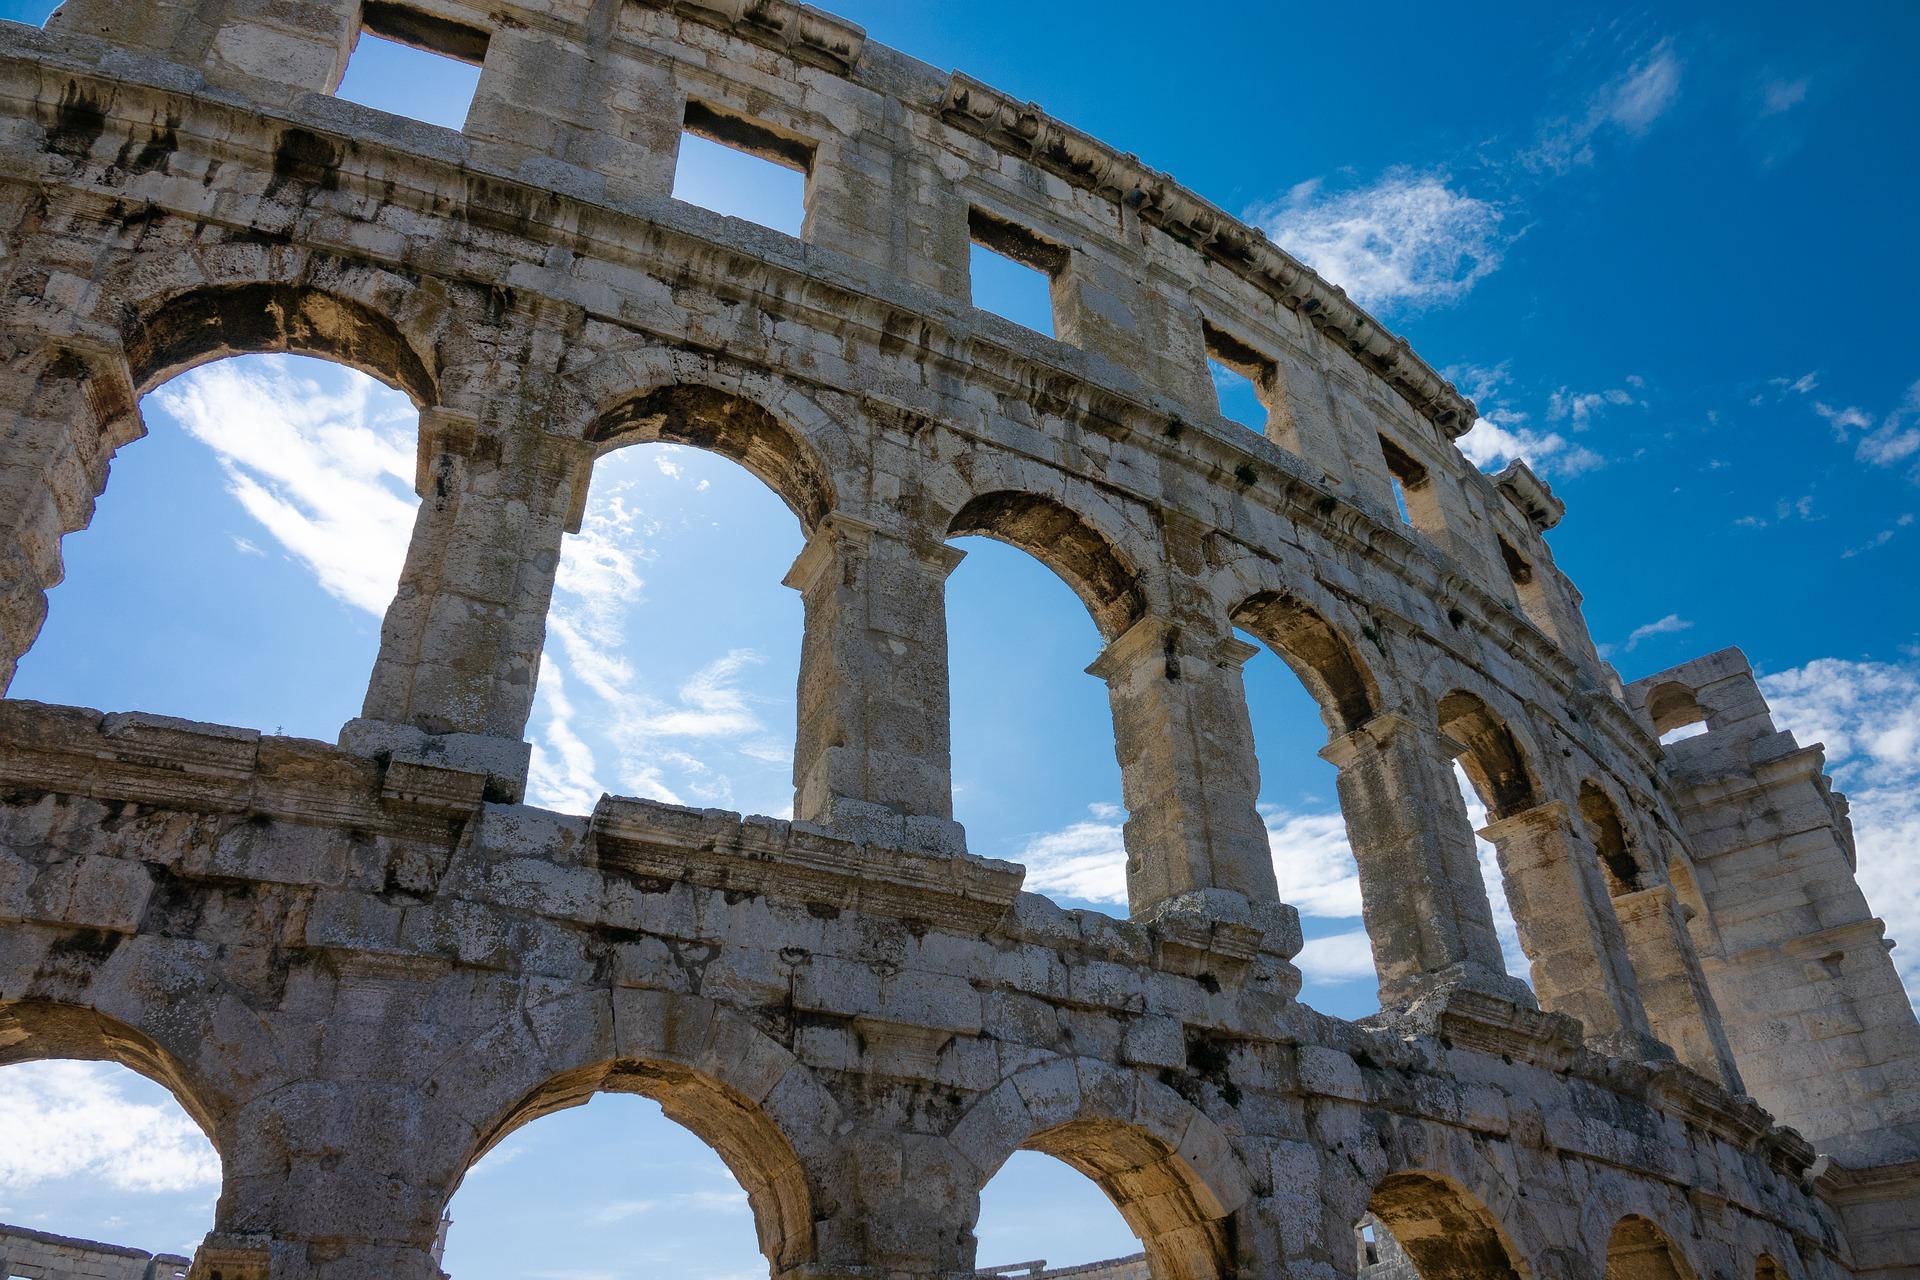 Closeup of the Roman Colosseum rotunda